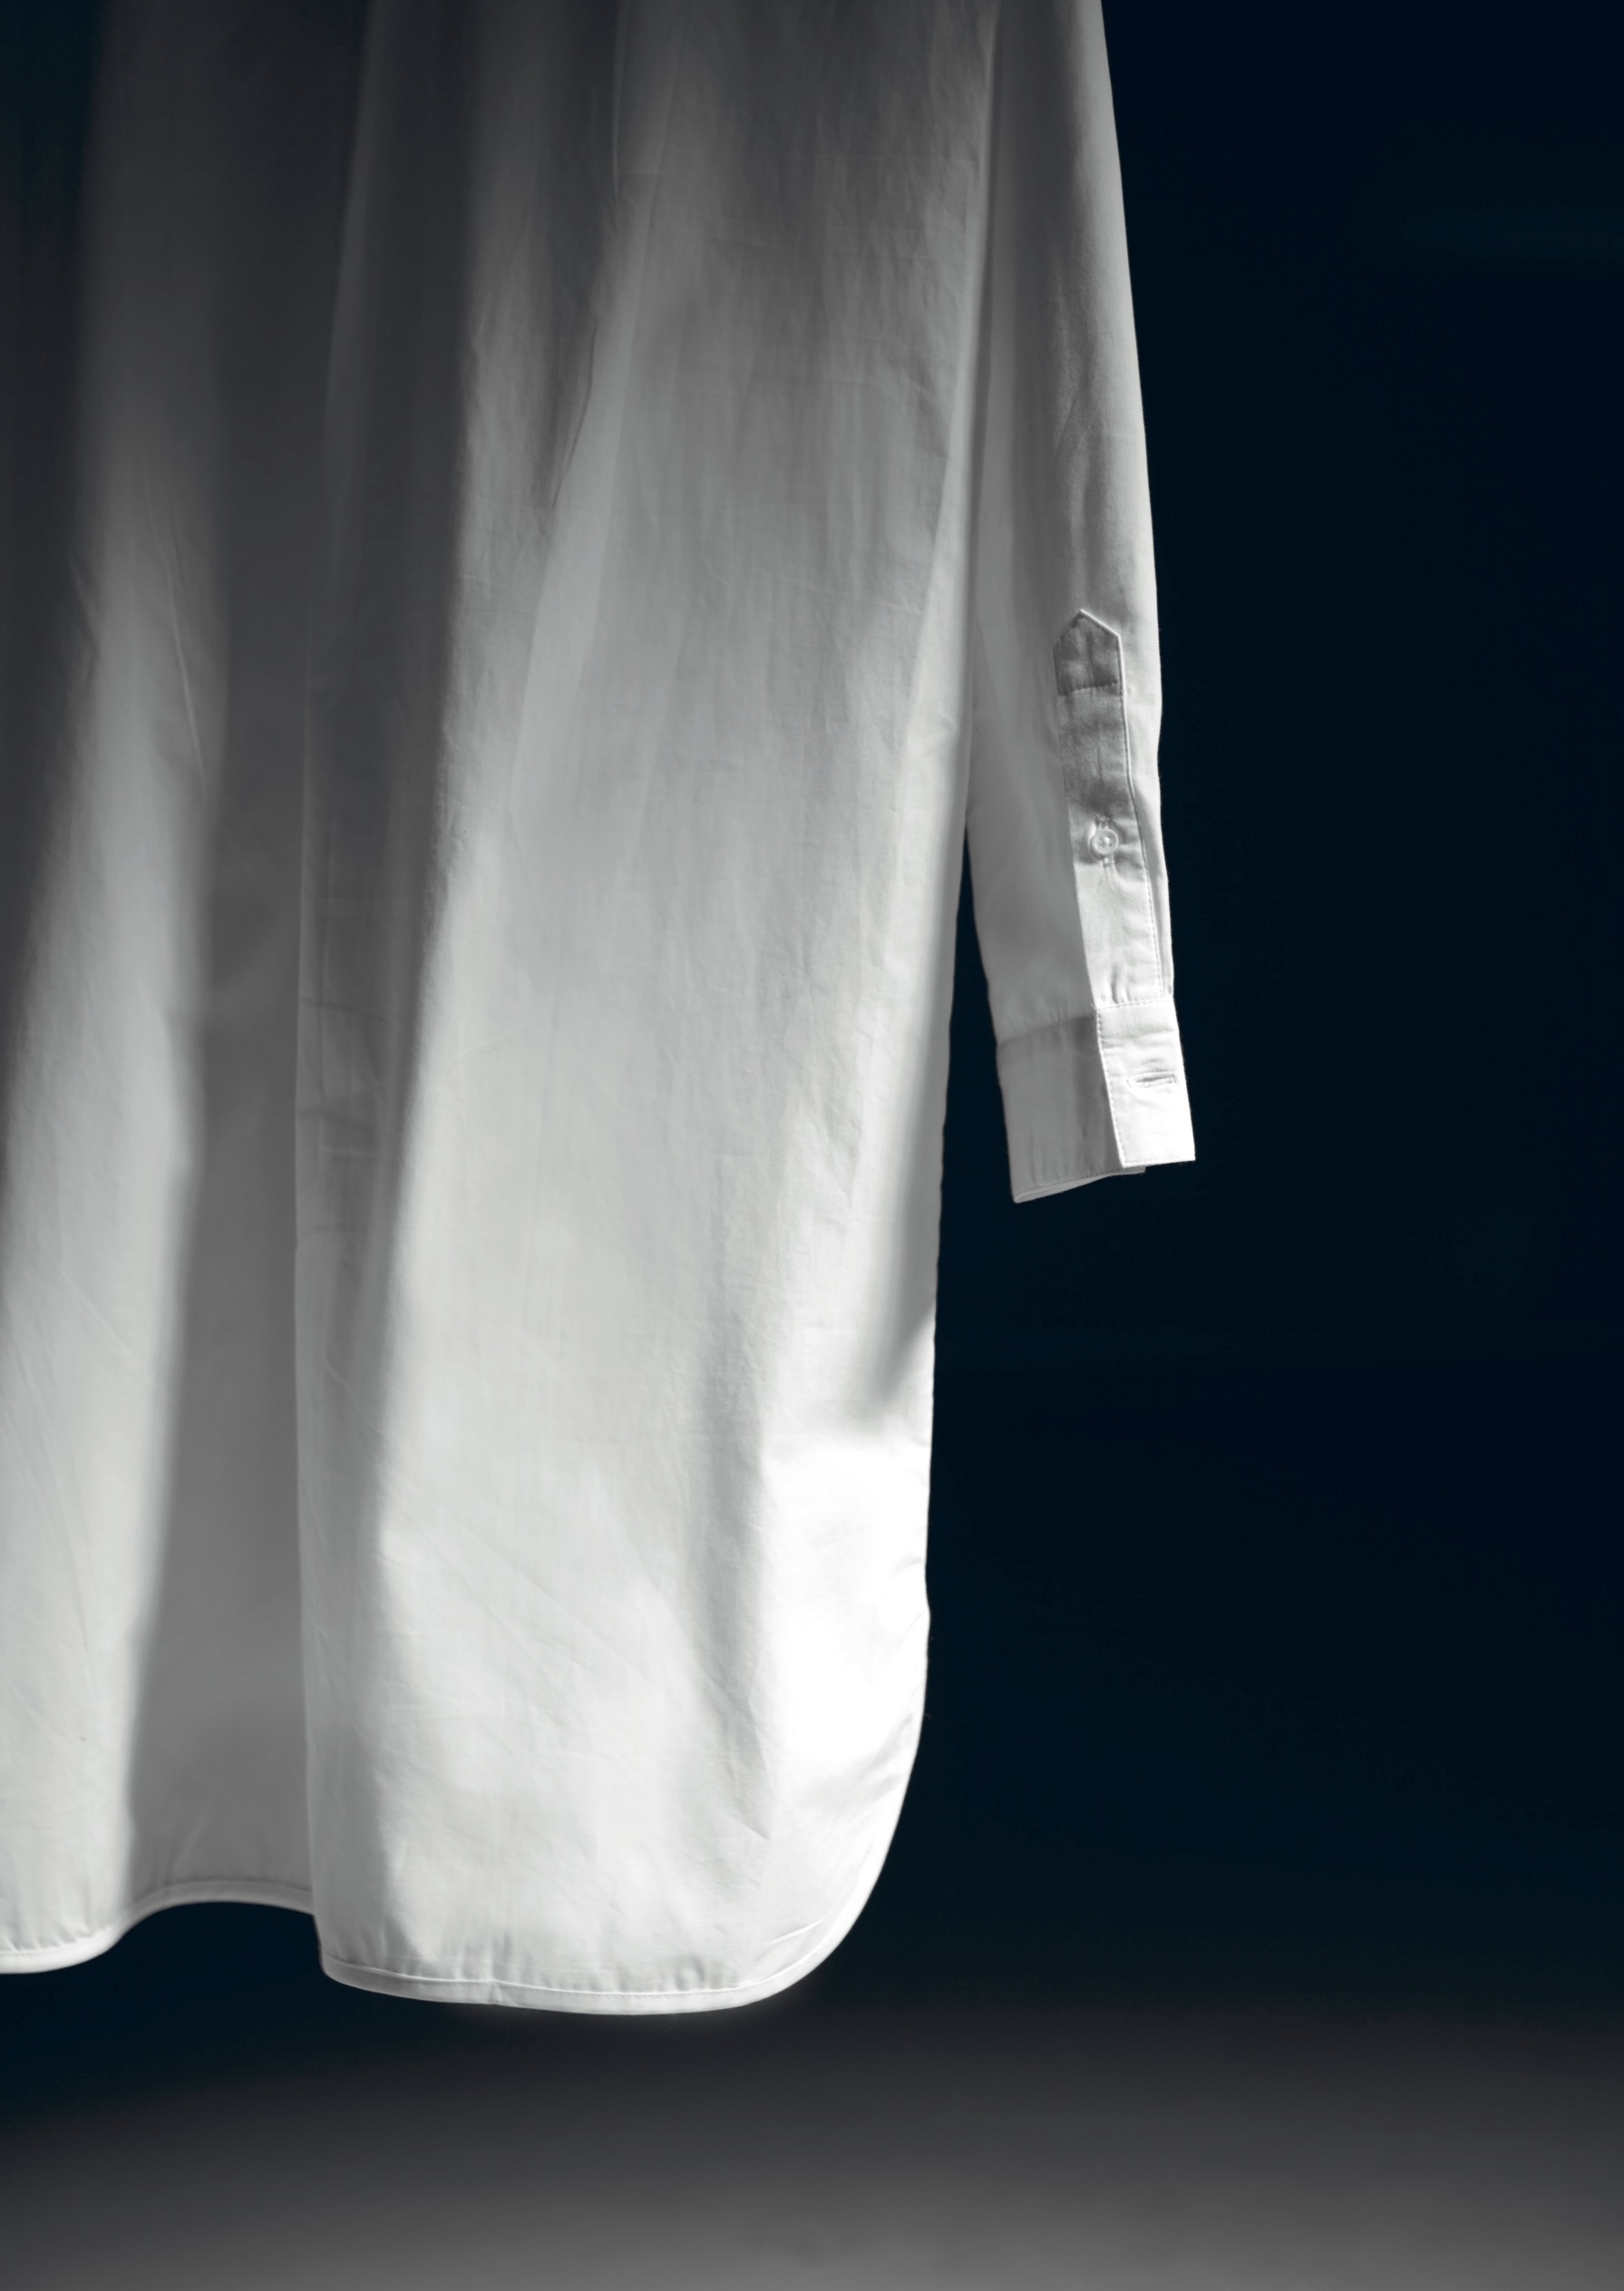 tfs-charliemary-ss16-white-blouse_26468826733_o.jpg